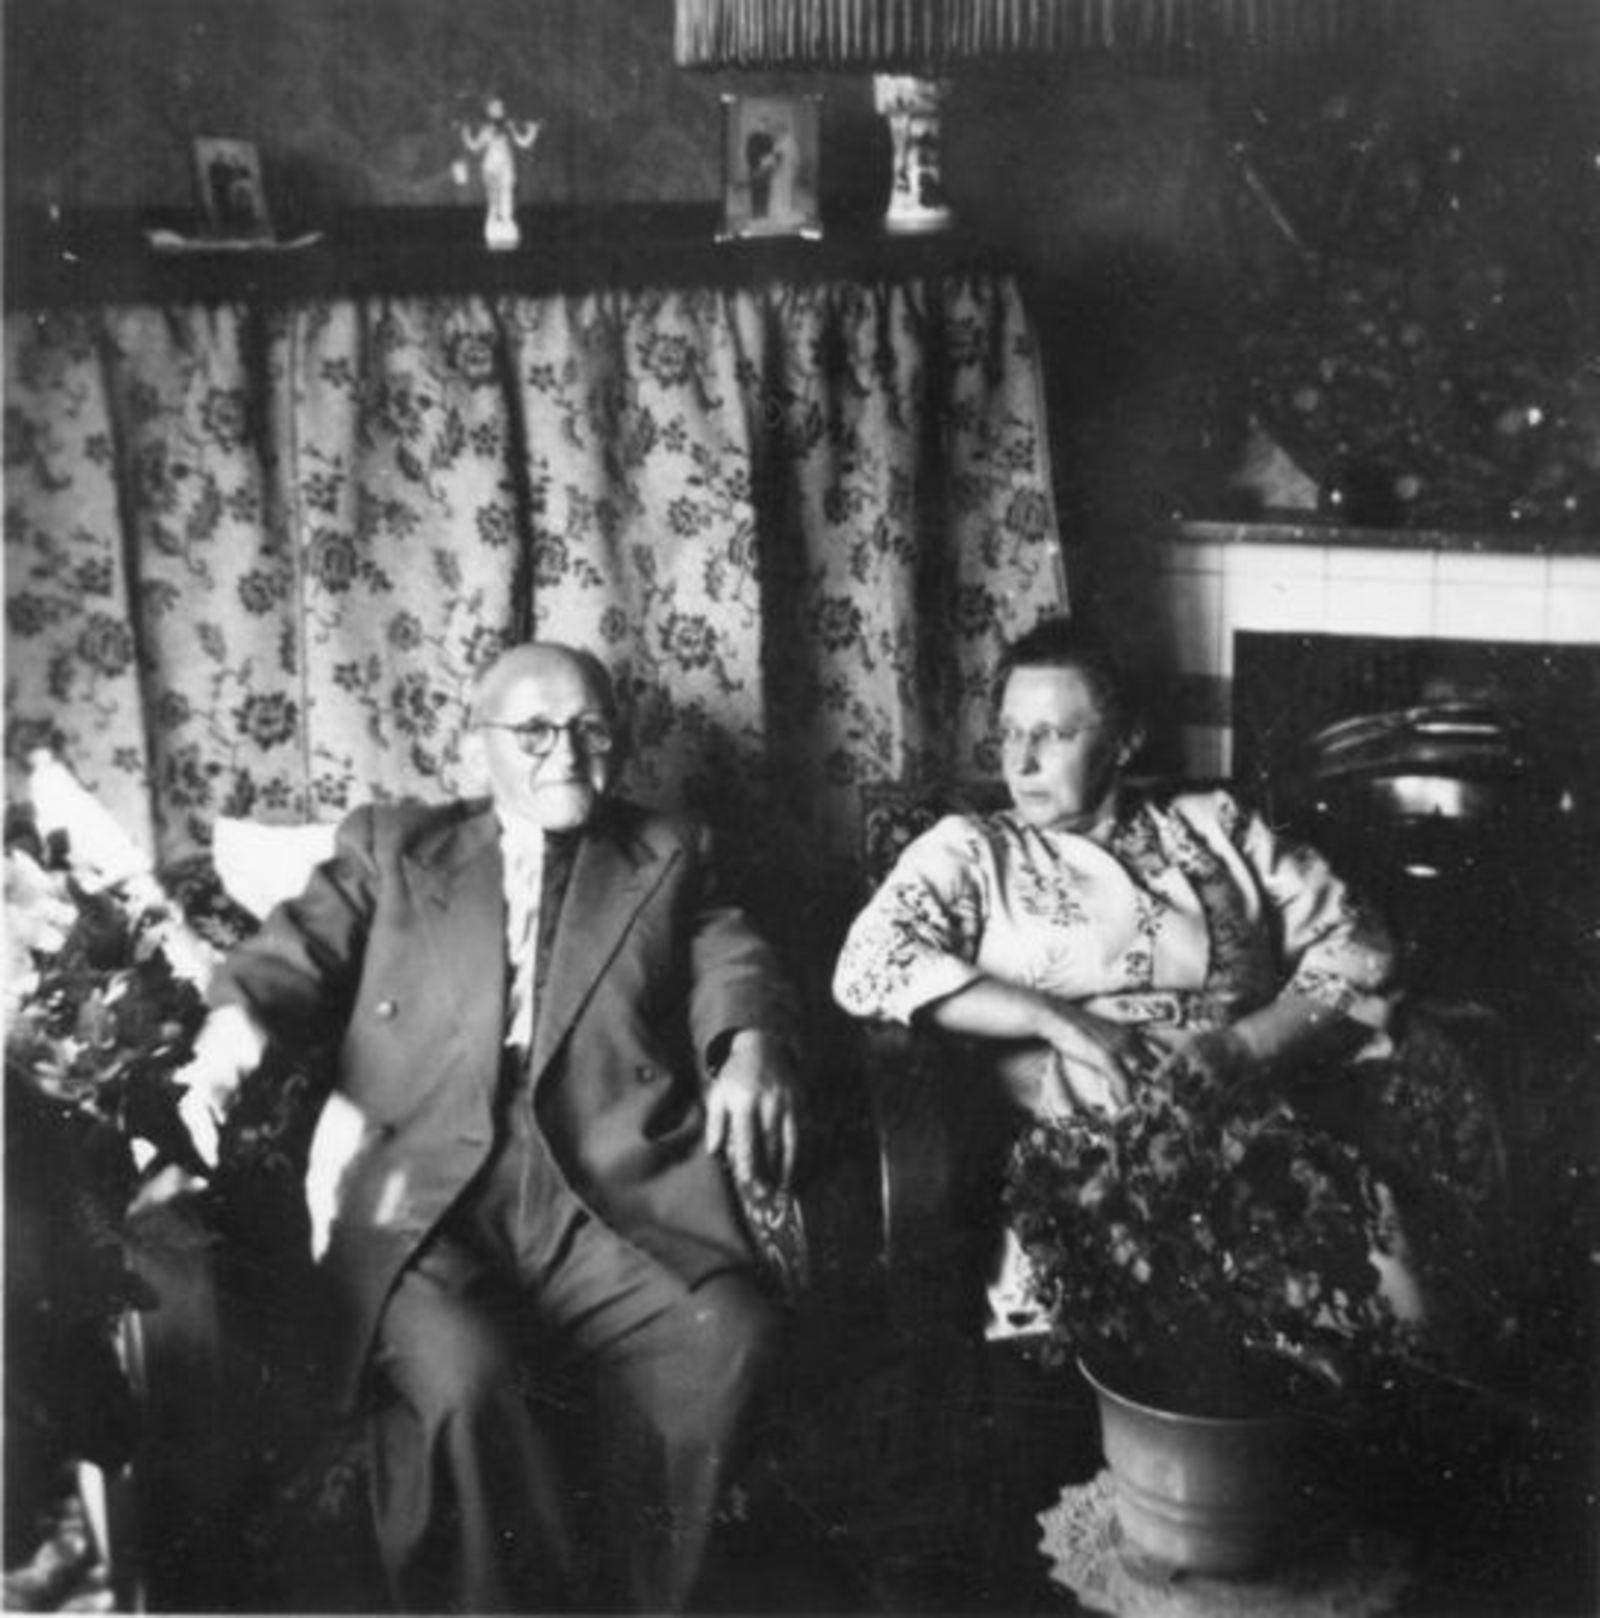 Broere Daniel 1890 19__ met vrouw Jacoba Vlug in Huis